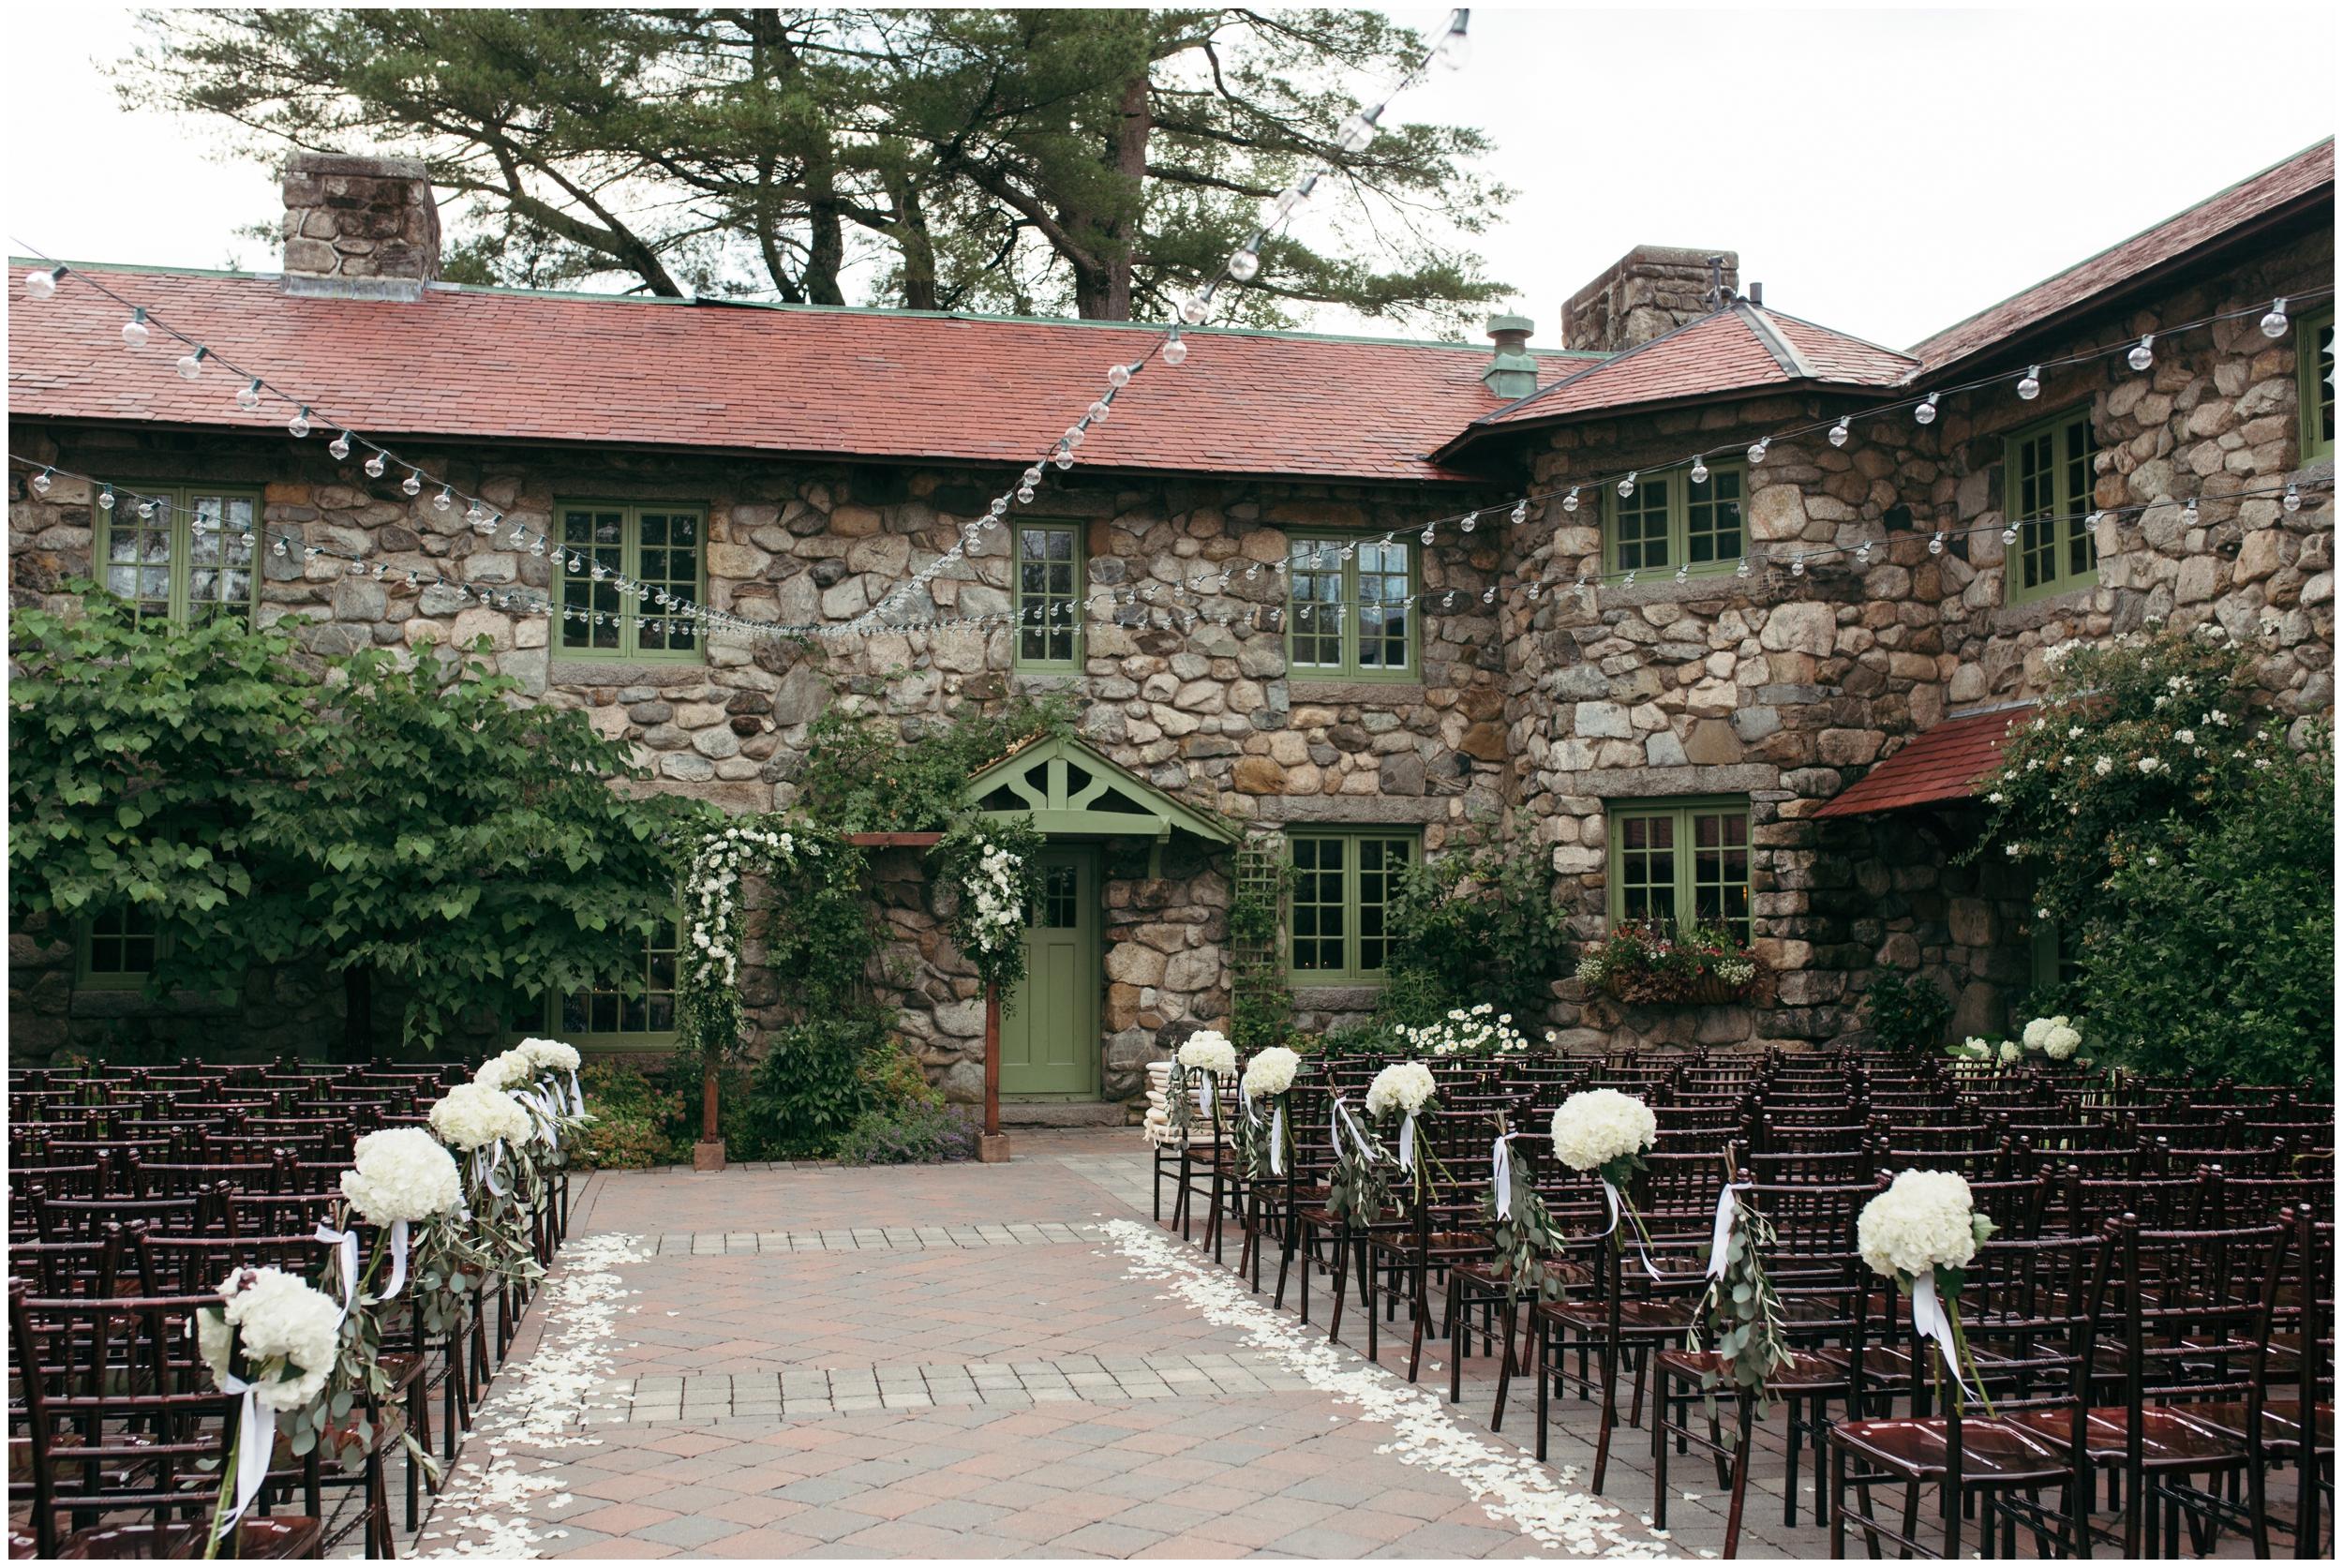 Willowdale-Estate-Wedding-Bailey-Q-Photo-Boston-Wedding-Photographer-022.JPG